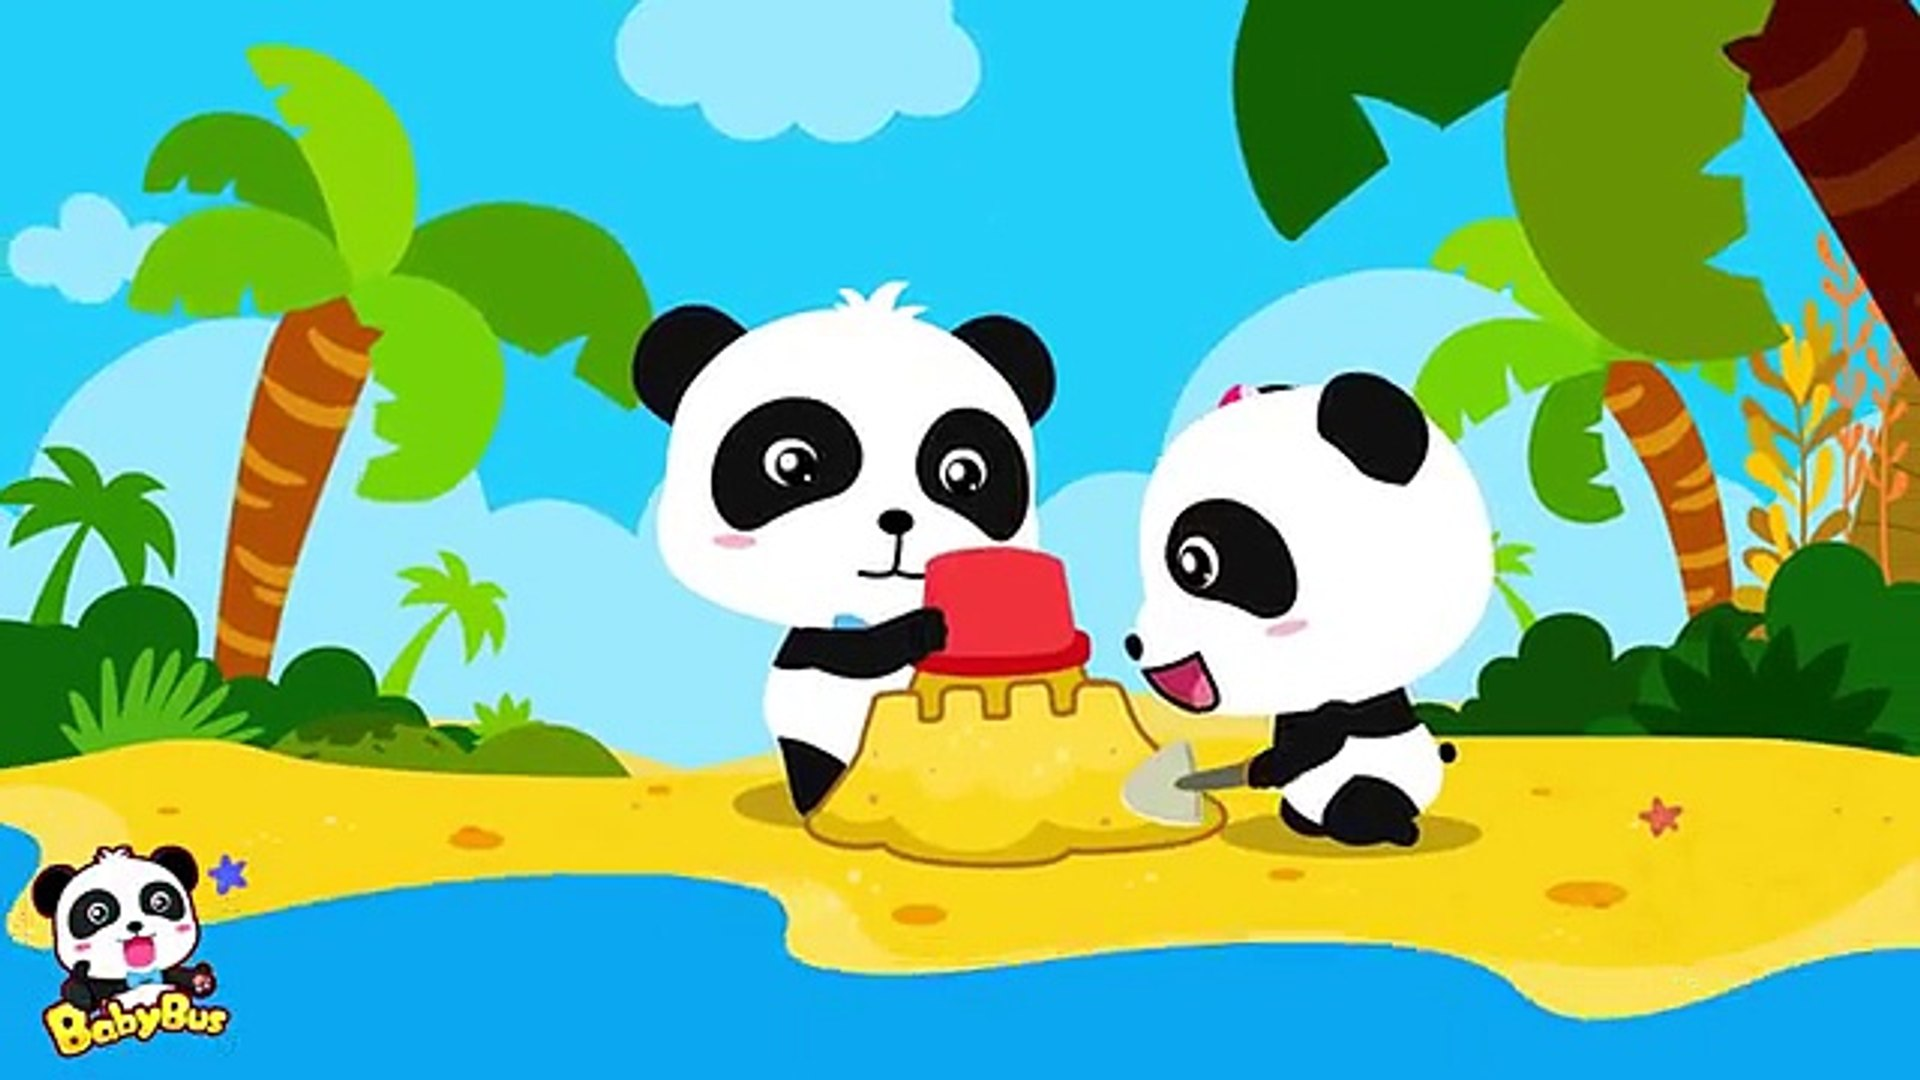 Crocodile River Surprise Crocodile Have A Baby Kids Funny Cartoon Videos Baby Panda Babybus Video Dailymotion